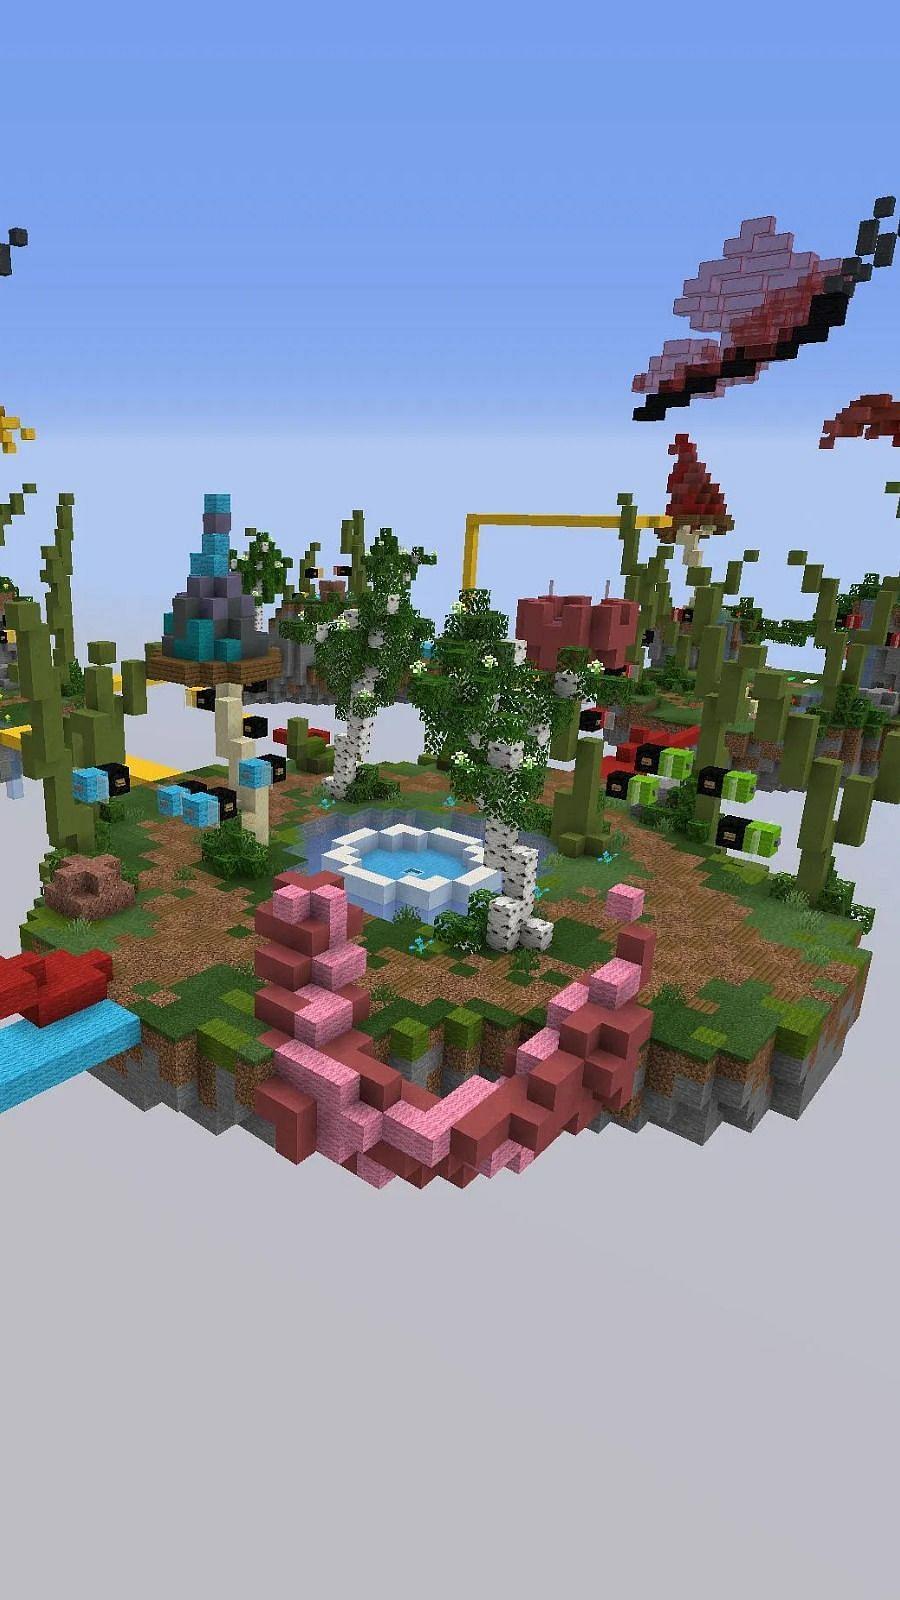 9 best Minecraft servers for Bedwars in 9